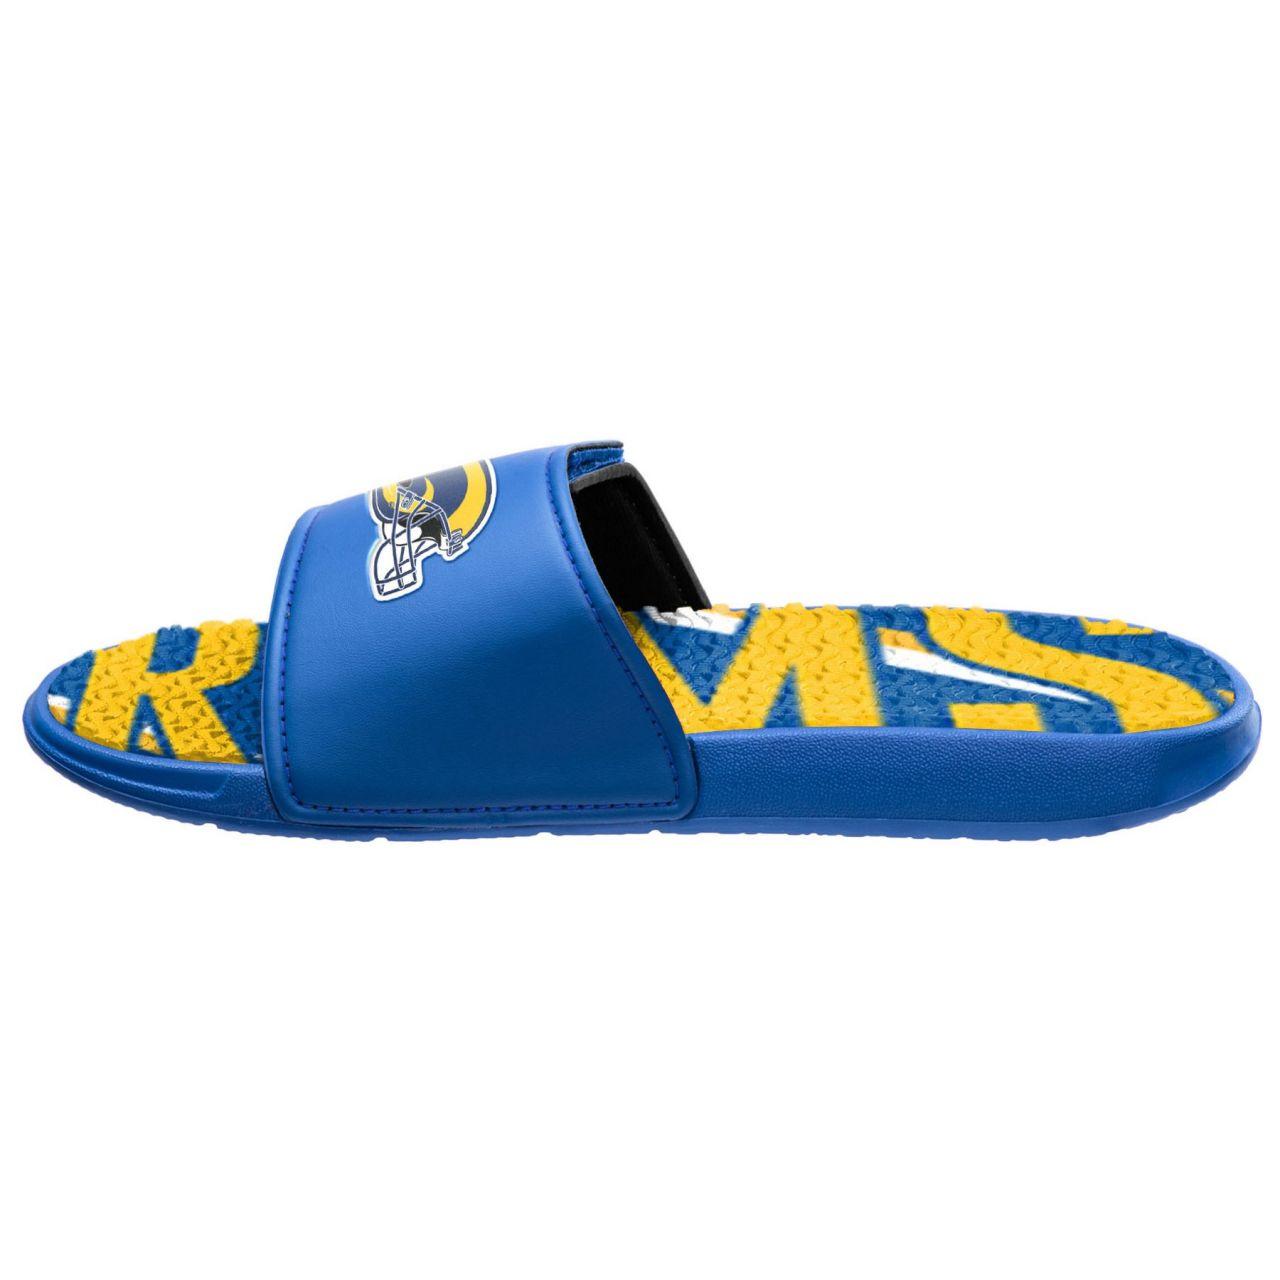 amfoo - Los Angeles Rams Badelatschen NFL GEL Sport Slides